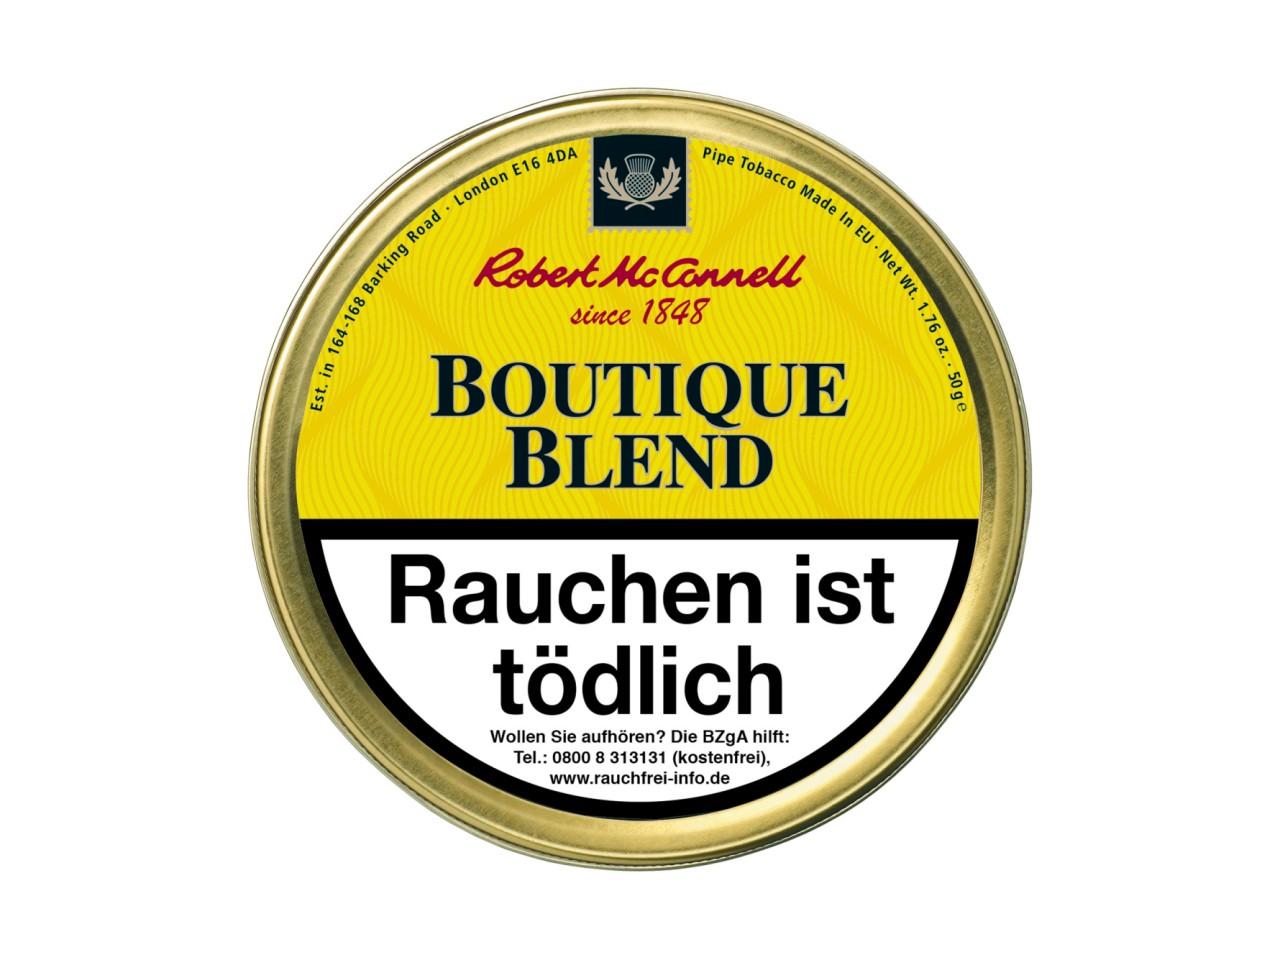 Robert McConnell Boutique Blend